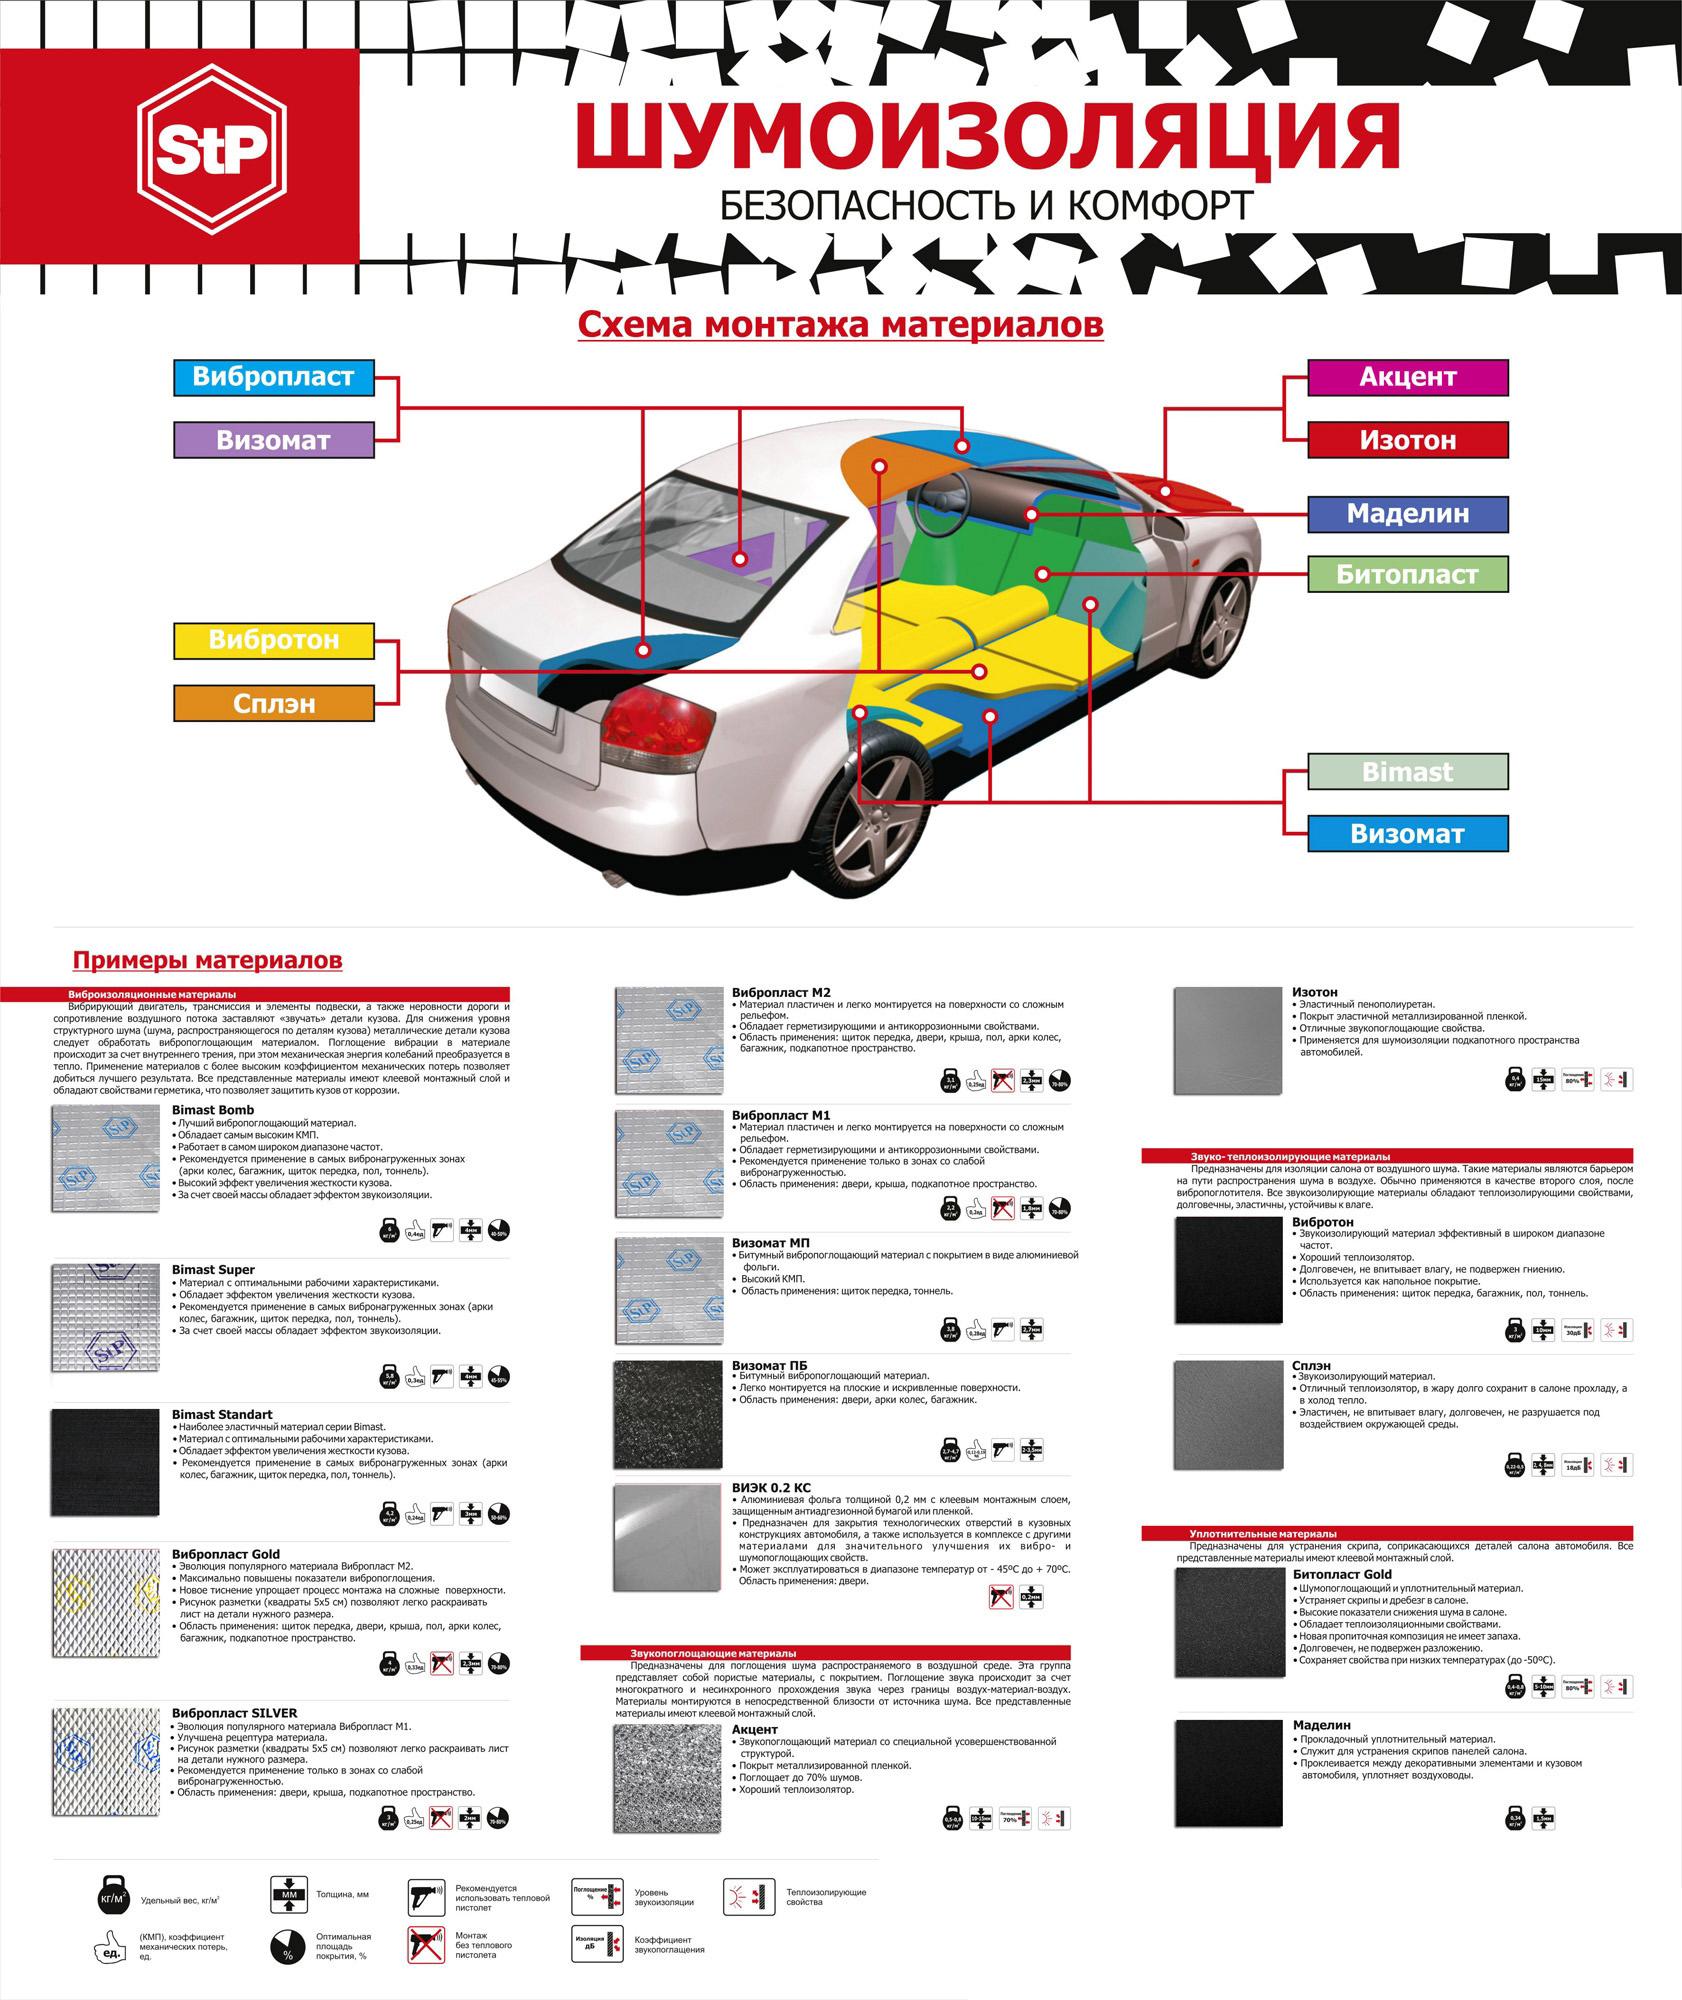 Схема монтажа материалов для автомобиля